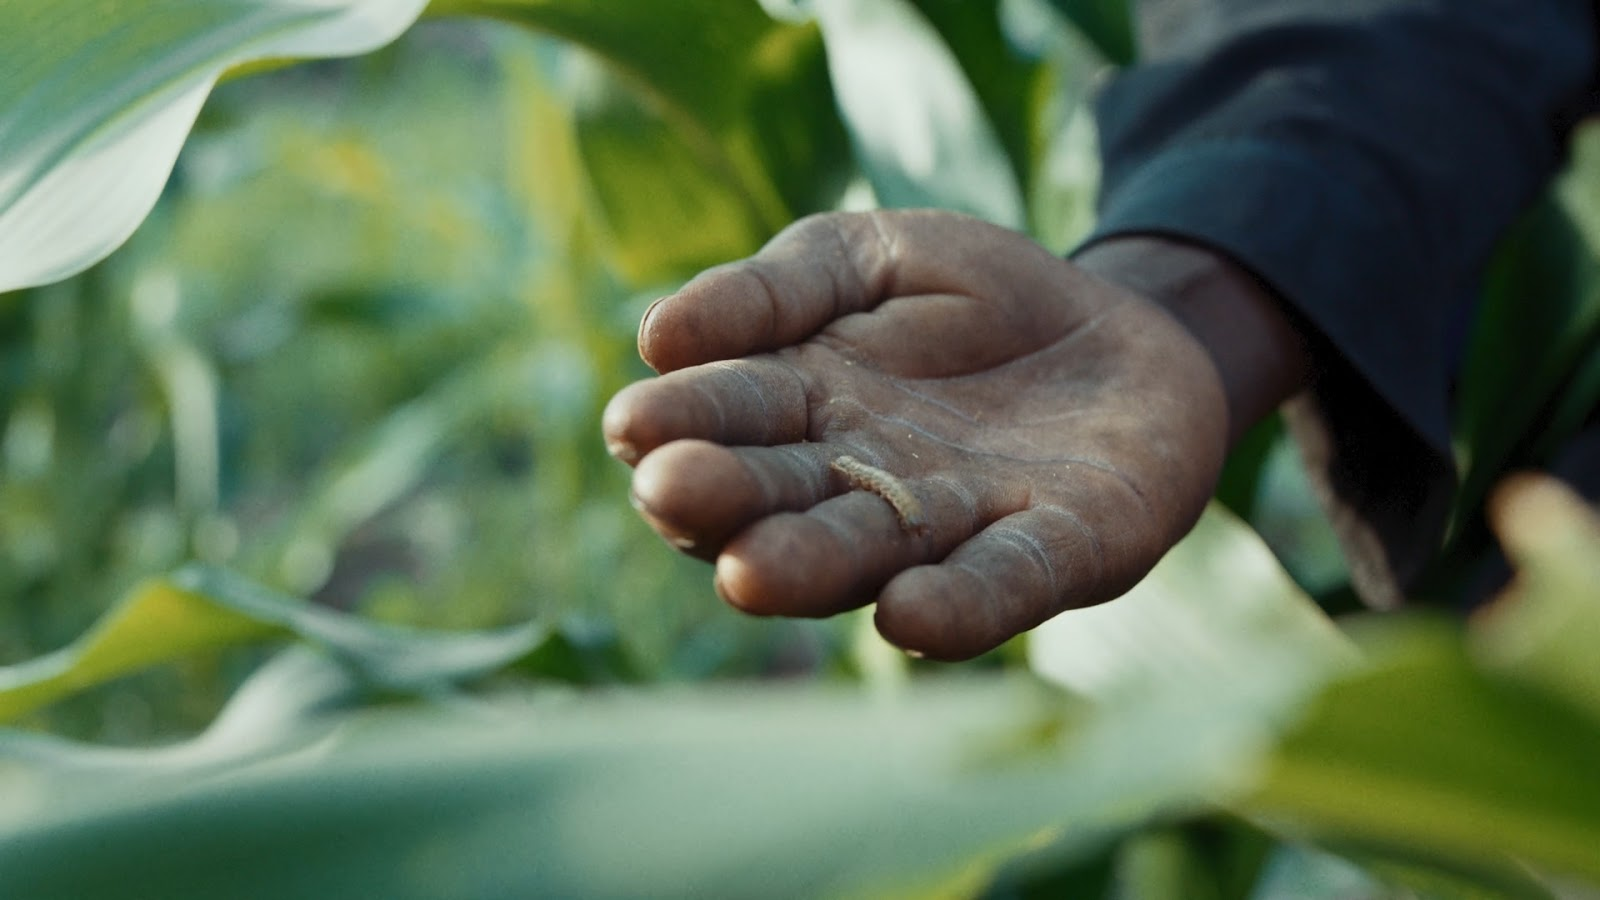 Fall Armyworm that threatens crops